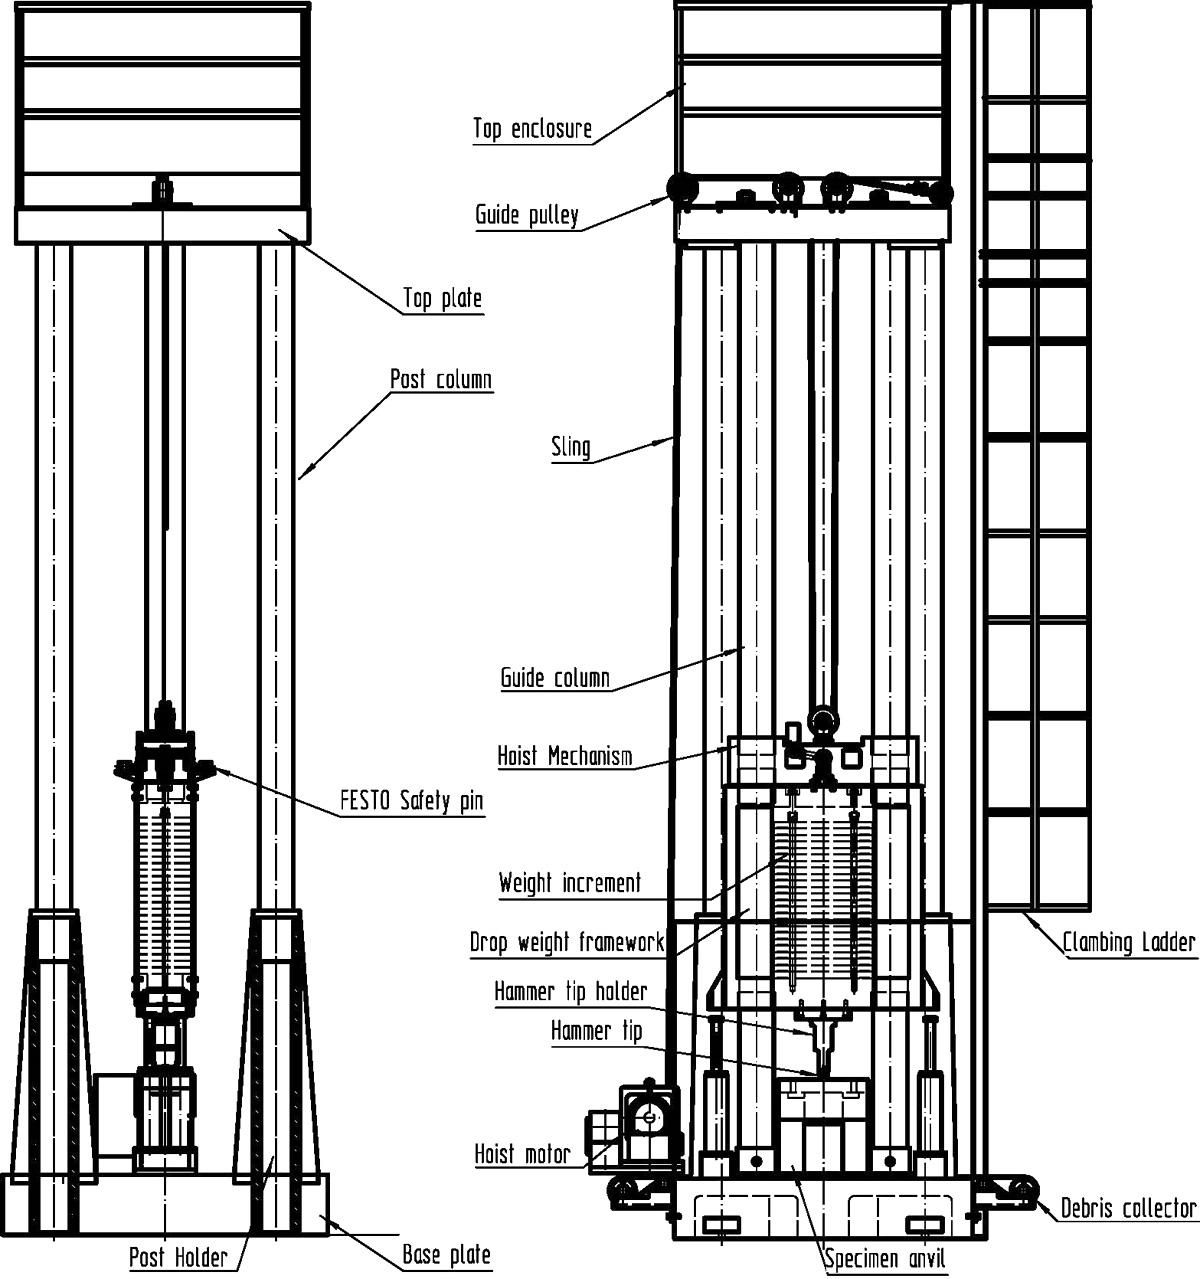 Drop Weight Tear Tester Design Structure